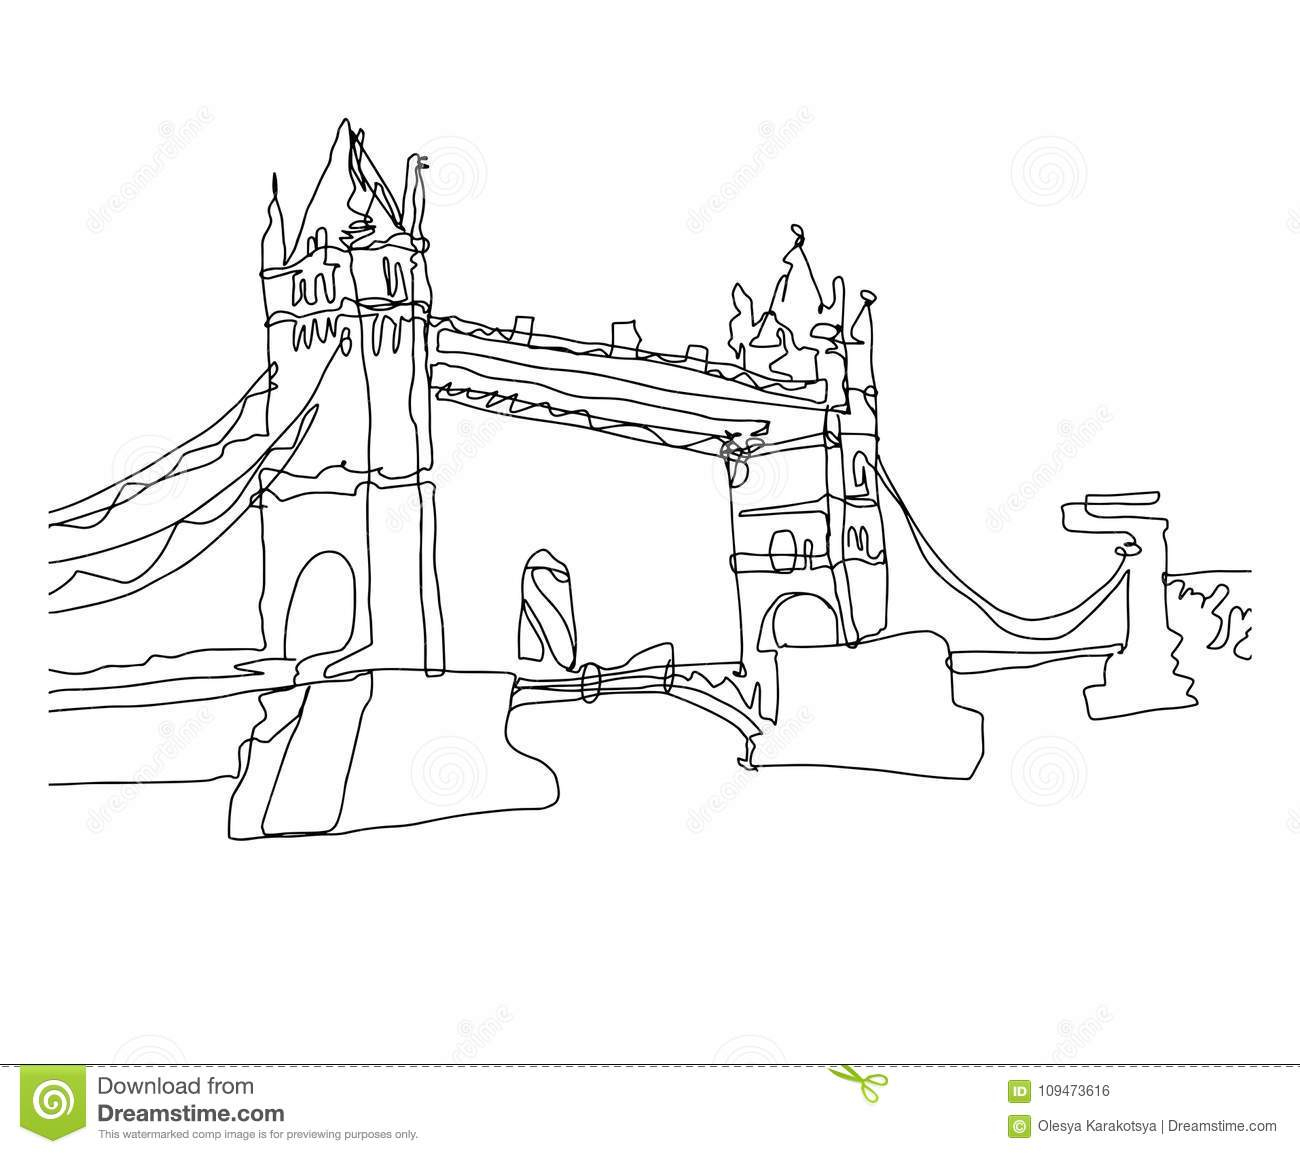 Continu Croquis De Dessin De Schéma De Pont De Tour, Londres encequiconcerne Dessin De Angleterre